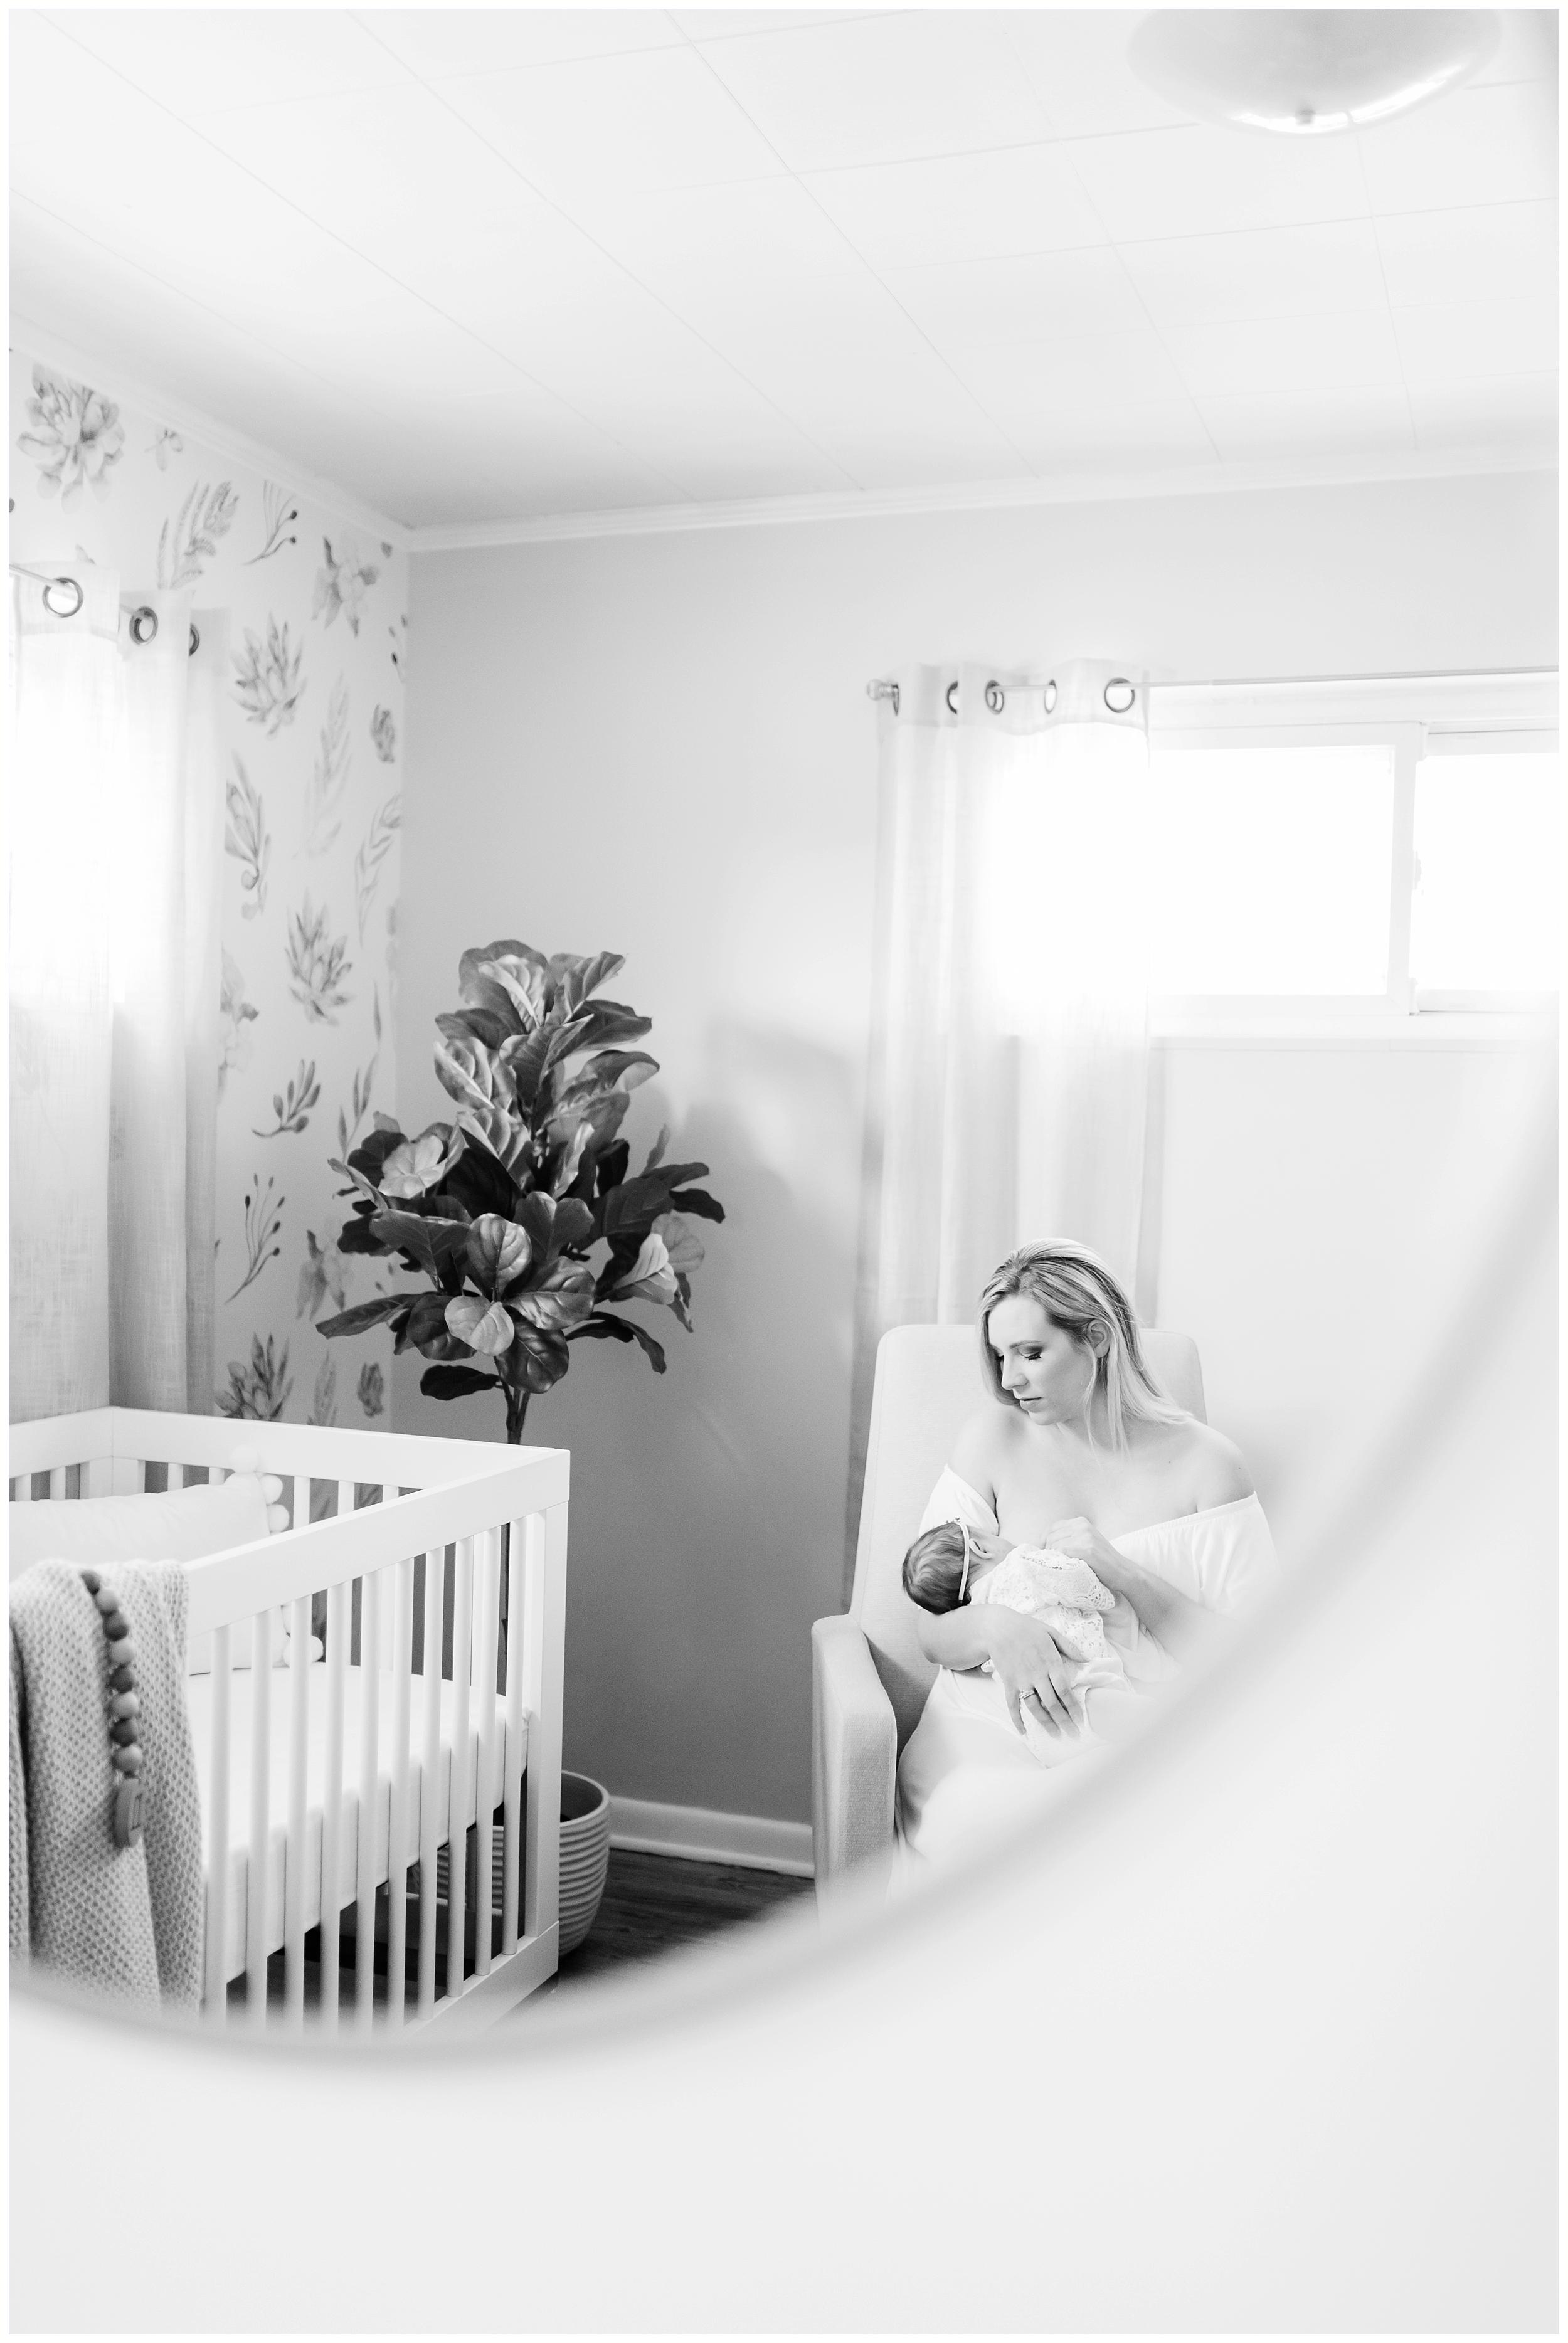 Priscilla Baierlein Photography